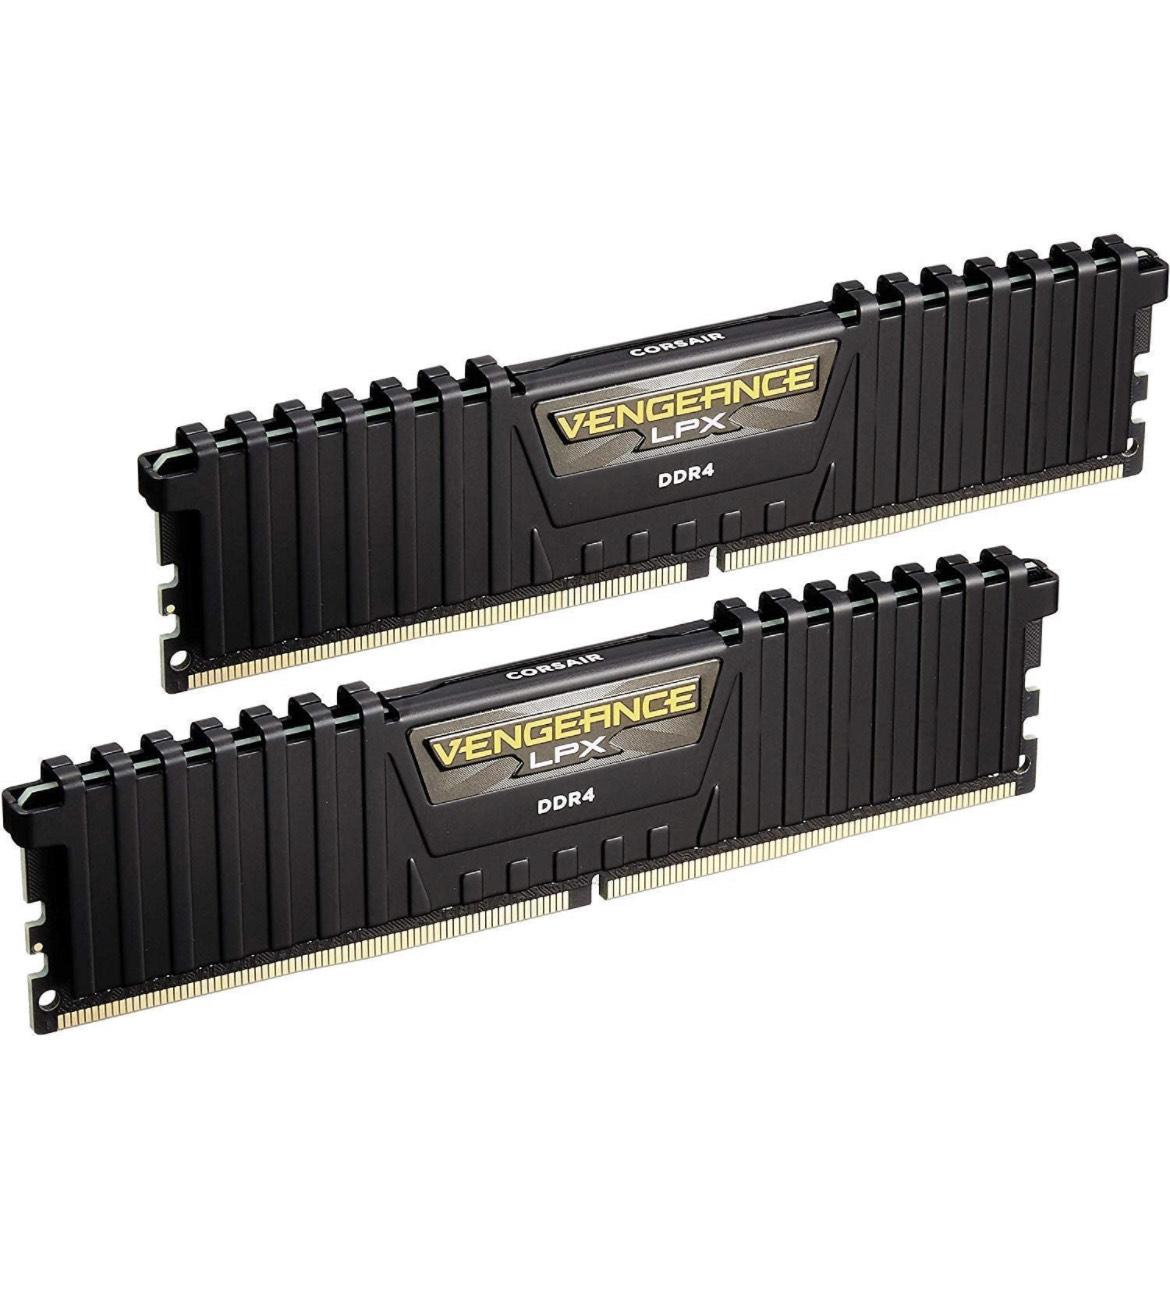 Corsair Vengeance 16gb DDR4 3000Mhz